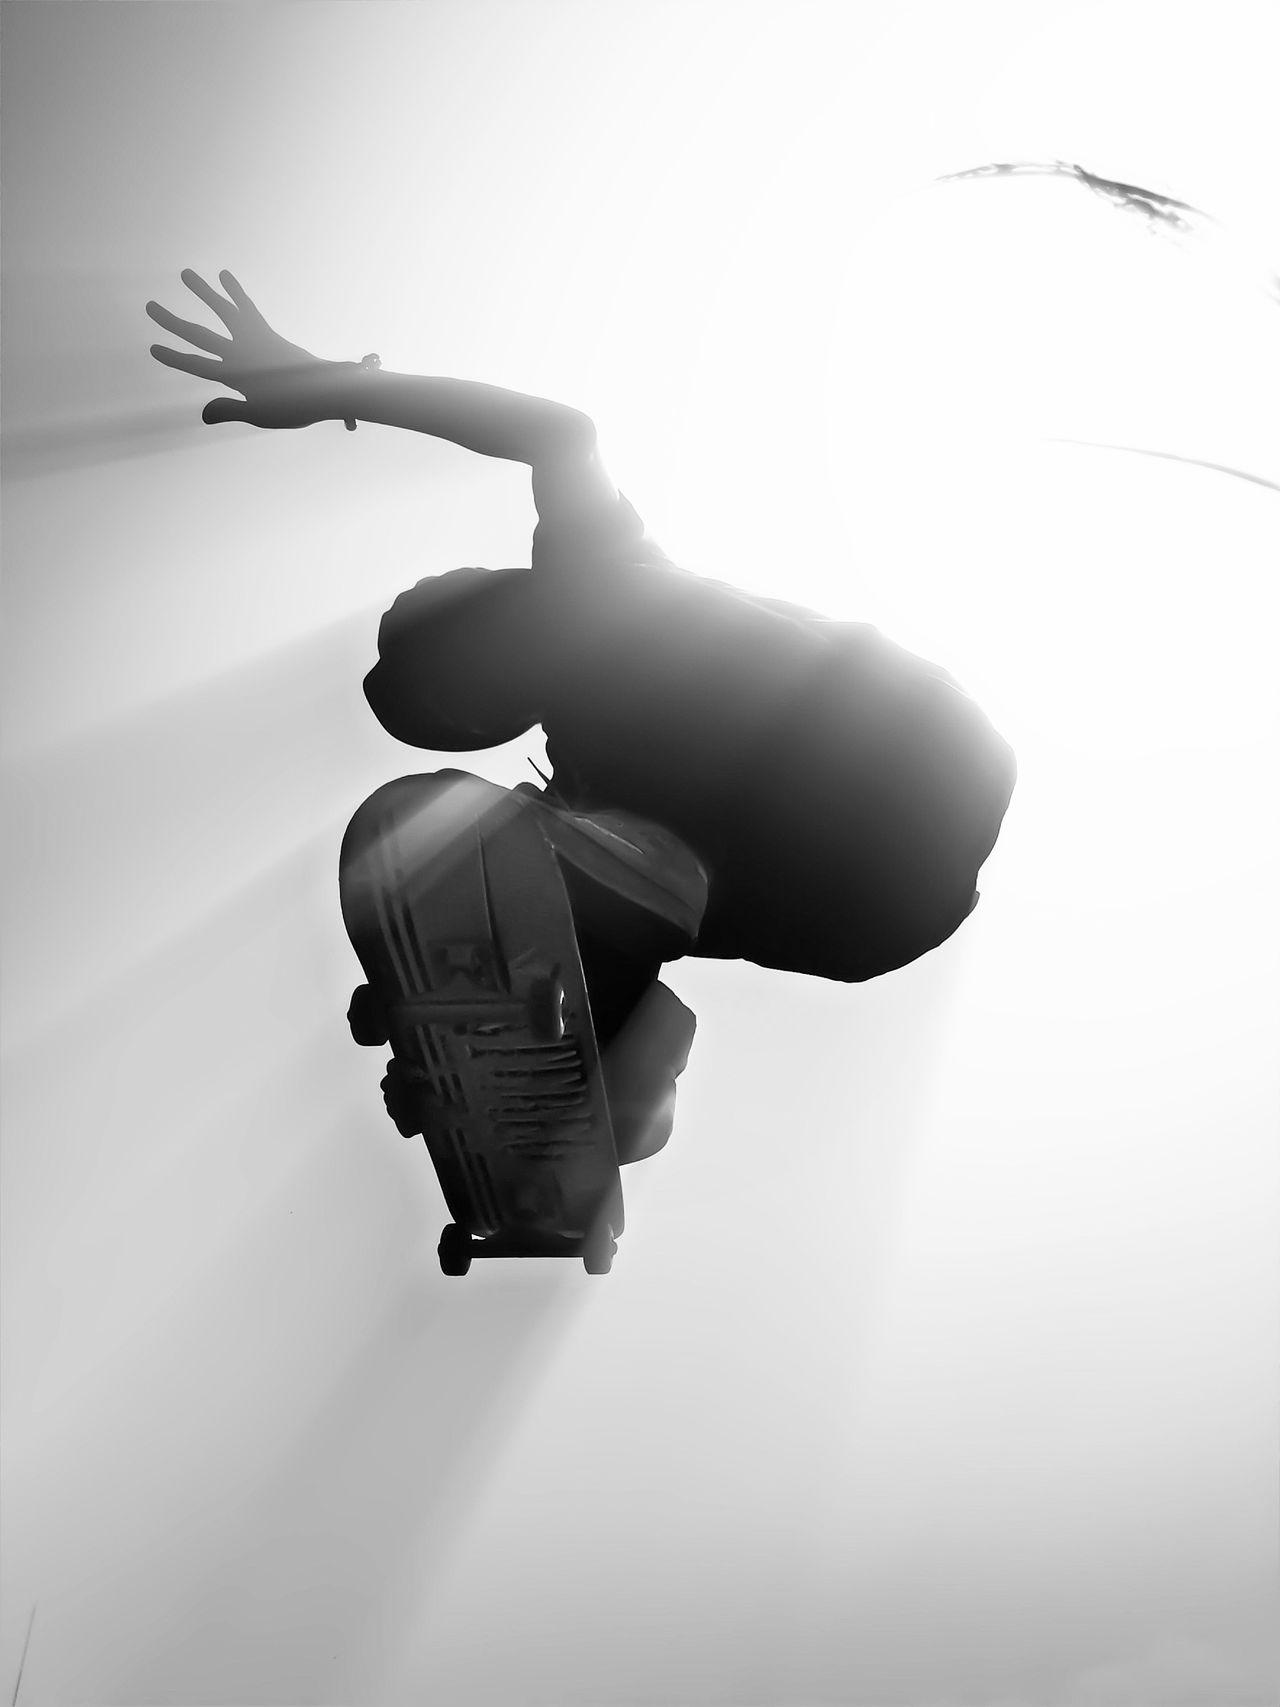 Directly below shot of man skateboarding against clear sky